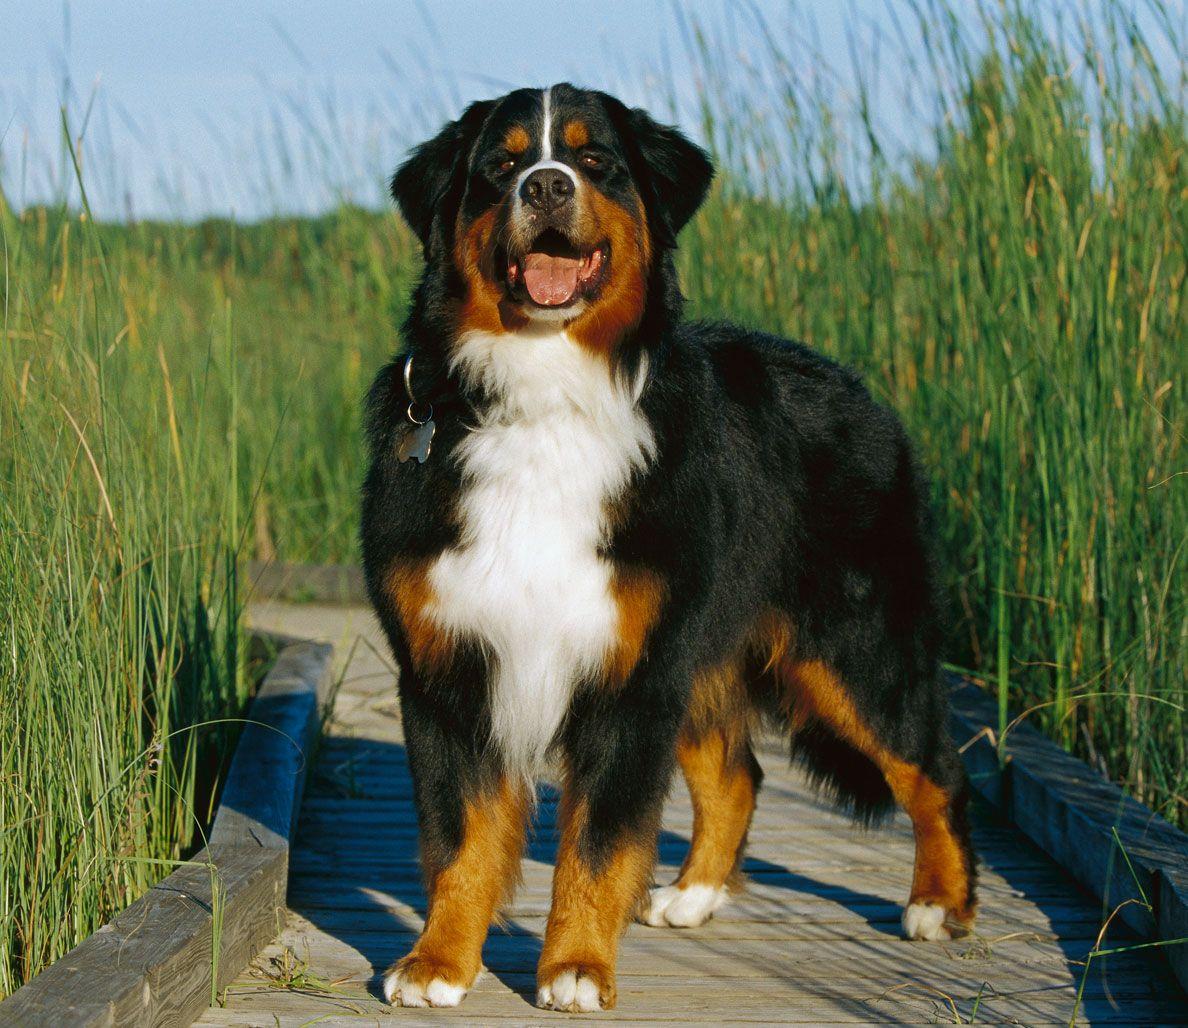 The 10 Spunkiest Dog Breeds - Bernese Mountain Dog